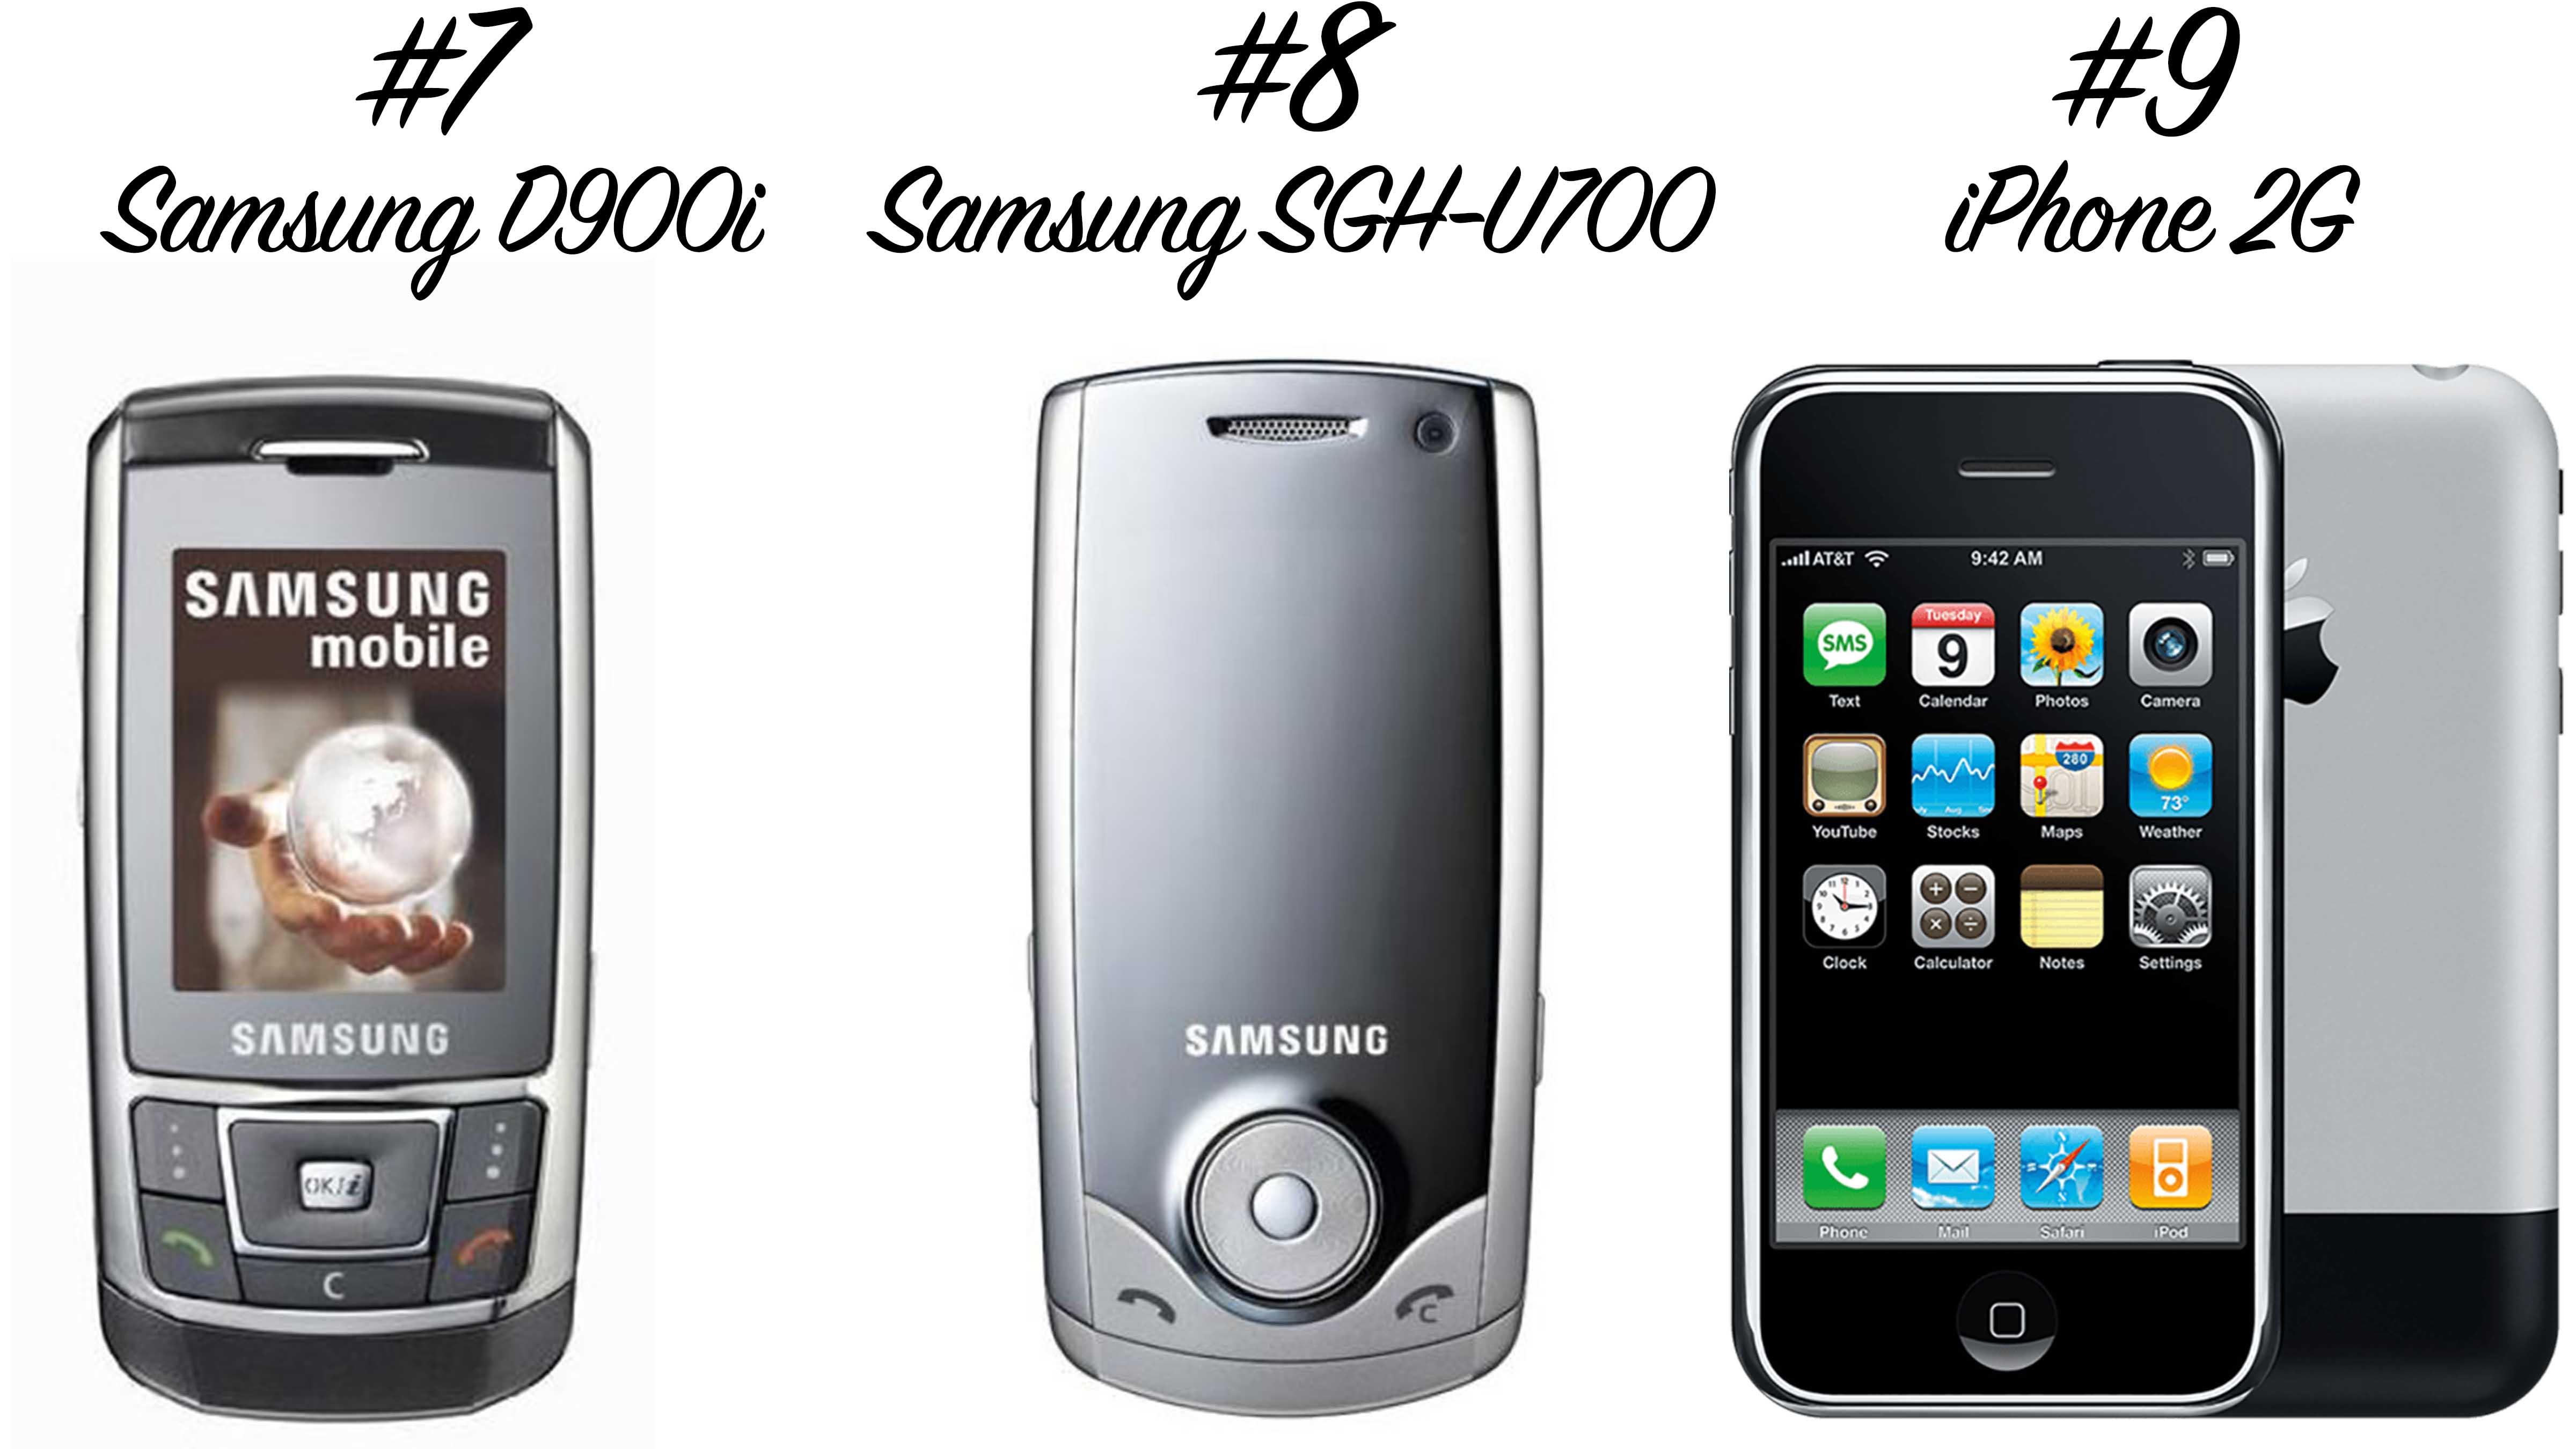 Retro Handys: Samsung D900i, Samsung SGH-U700, iPhone 2G